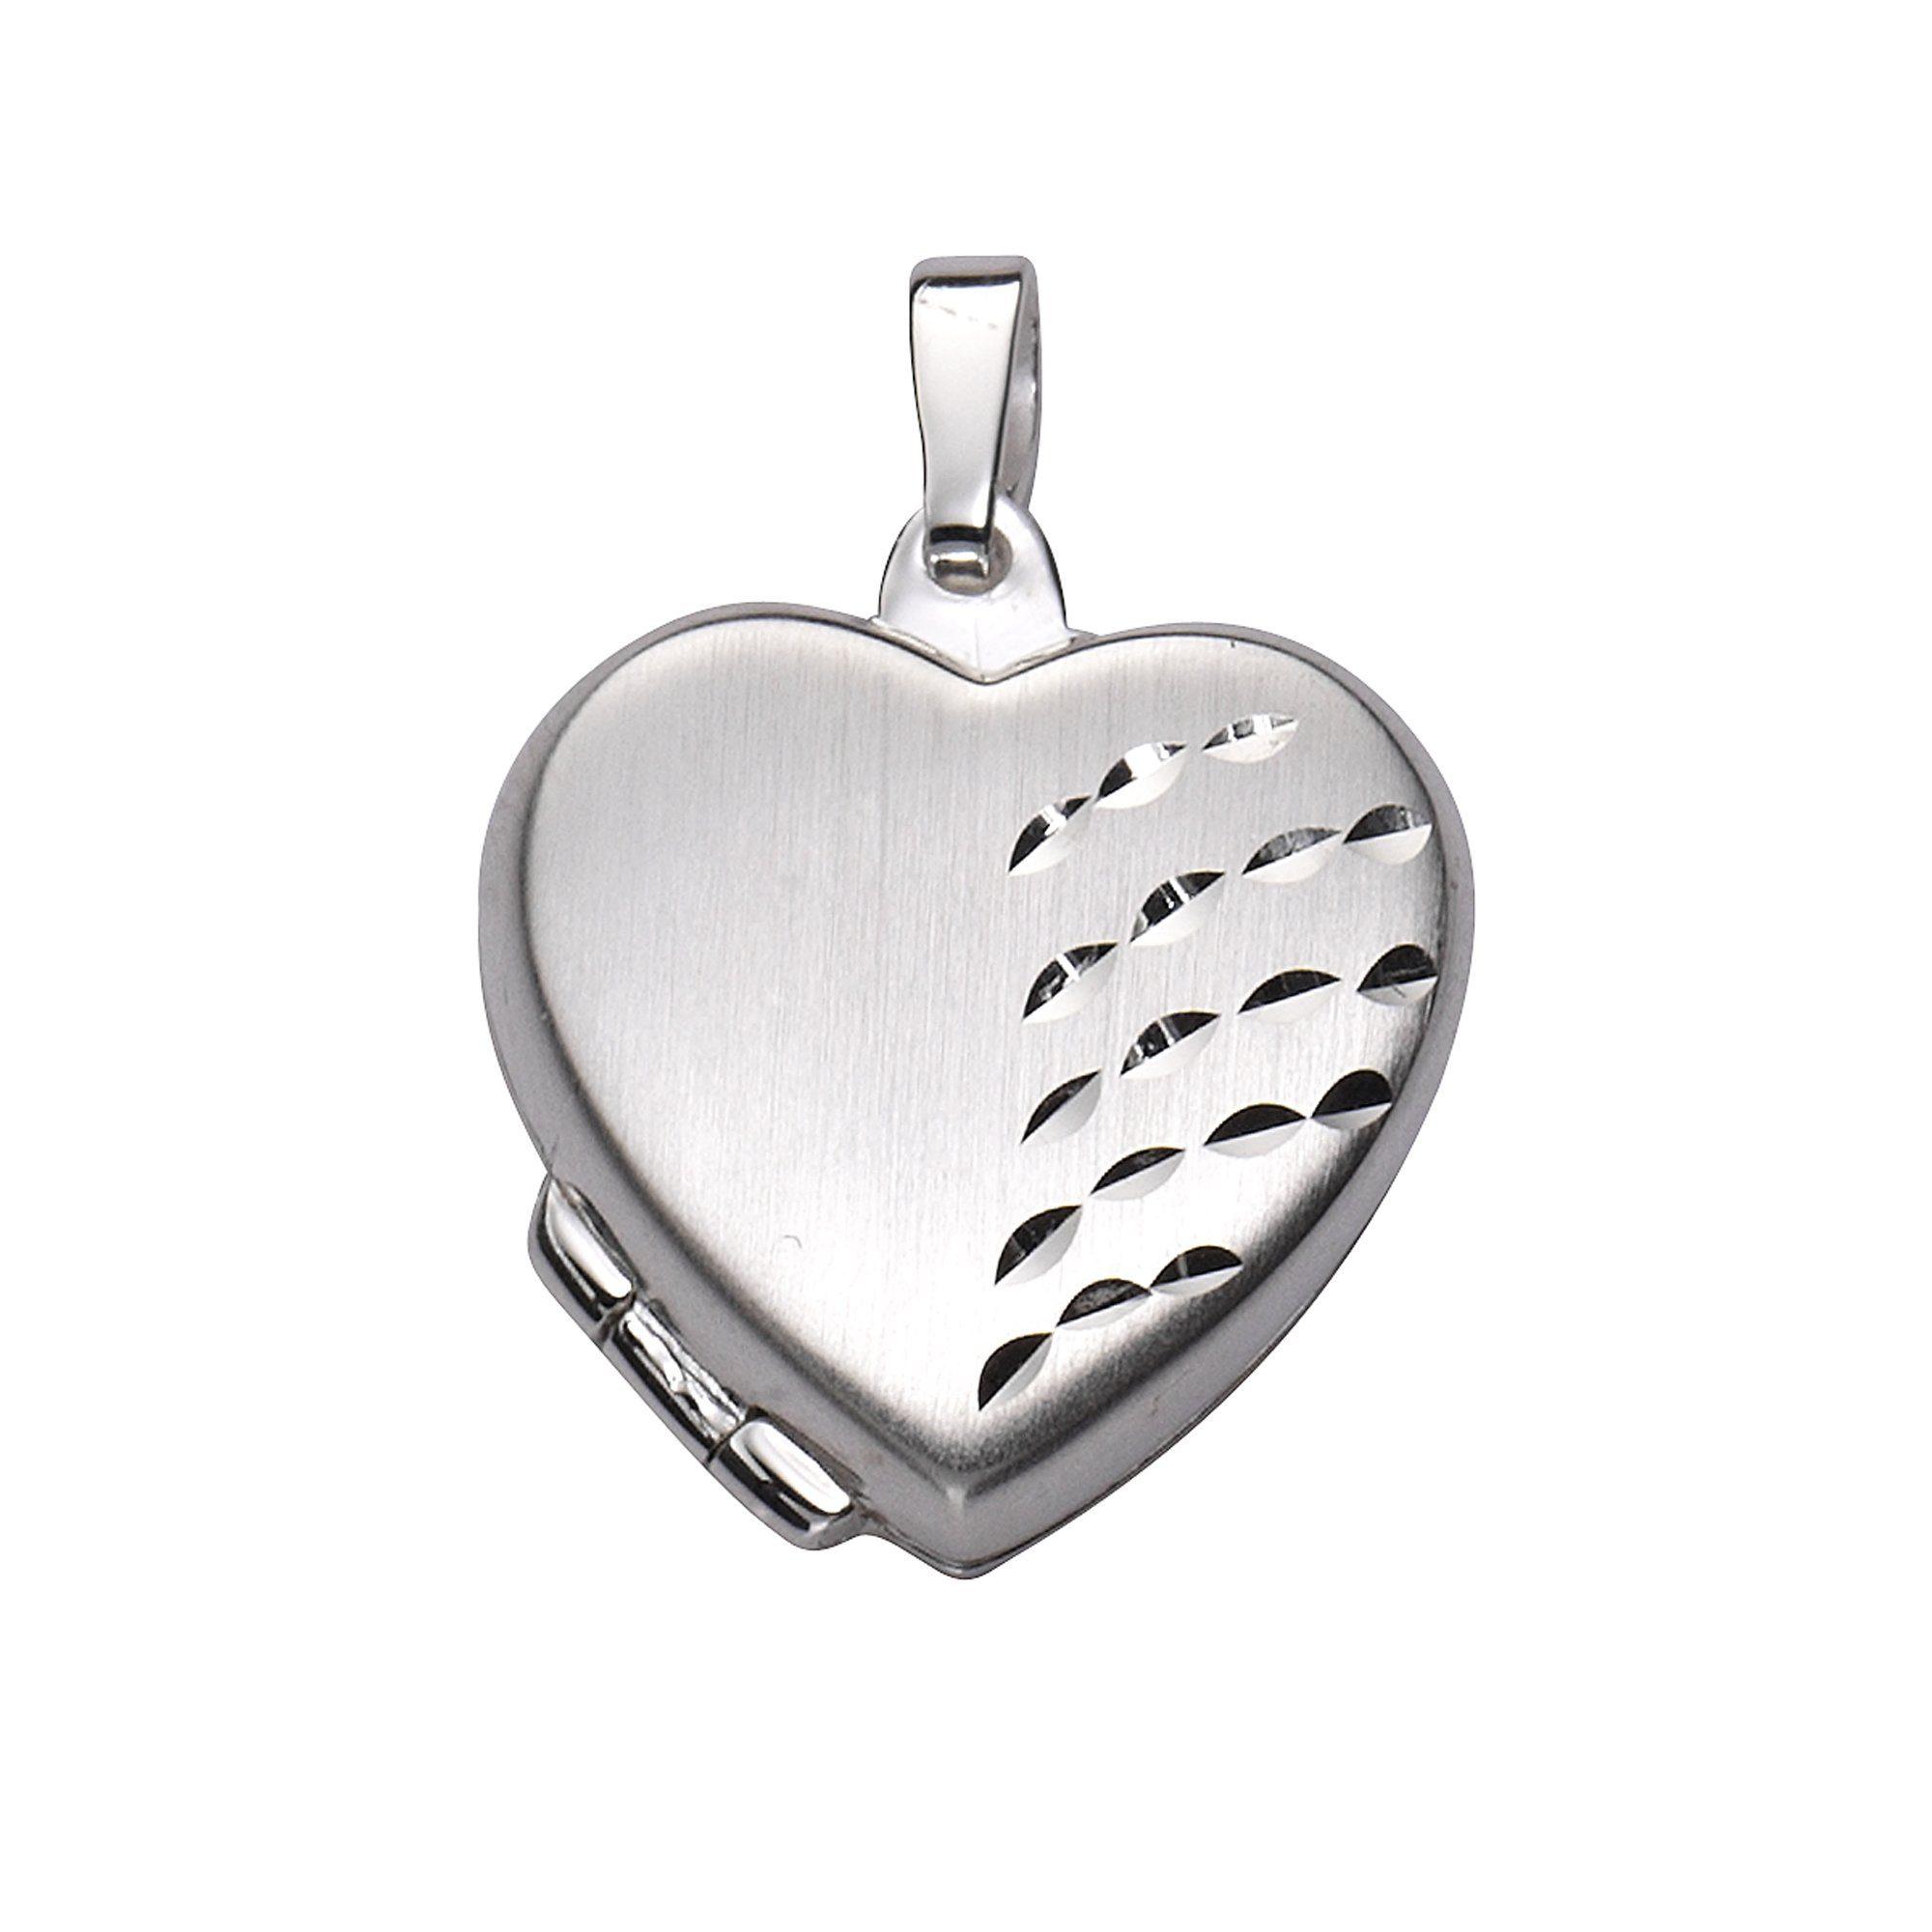 Zeeme Anhänger 925/- Sterling Silber Herz Medaillon | Schmuck > Halsketten > Herzketten | Weiß | Stein | Zeeme